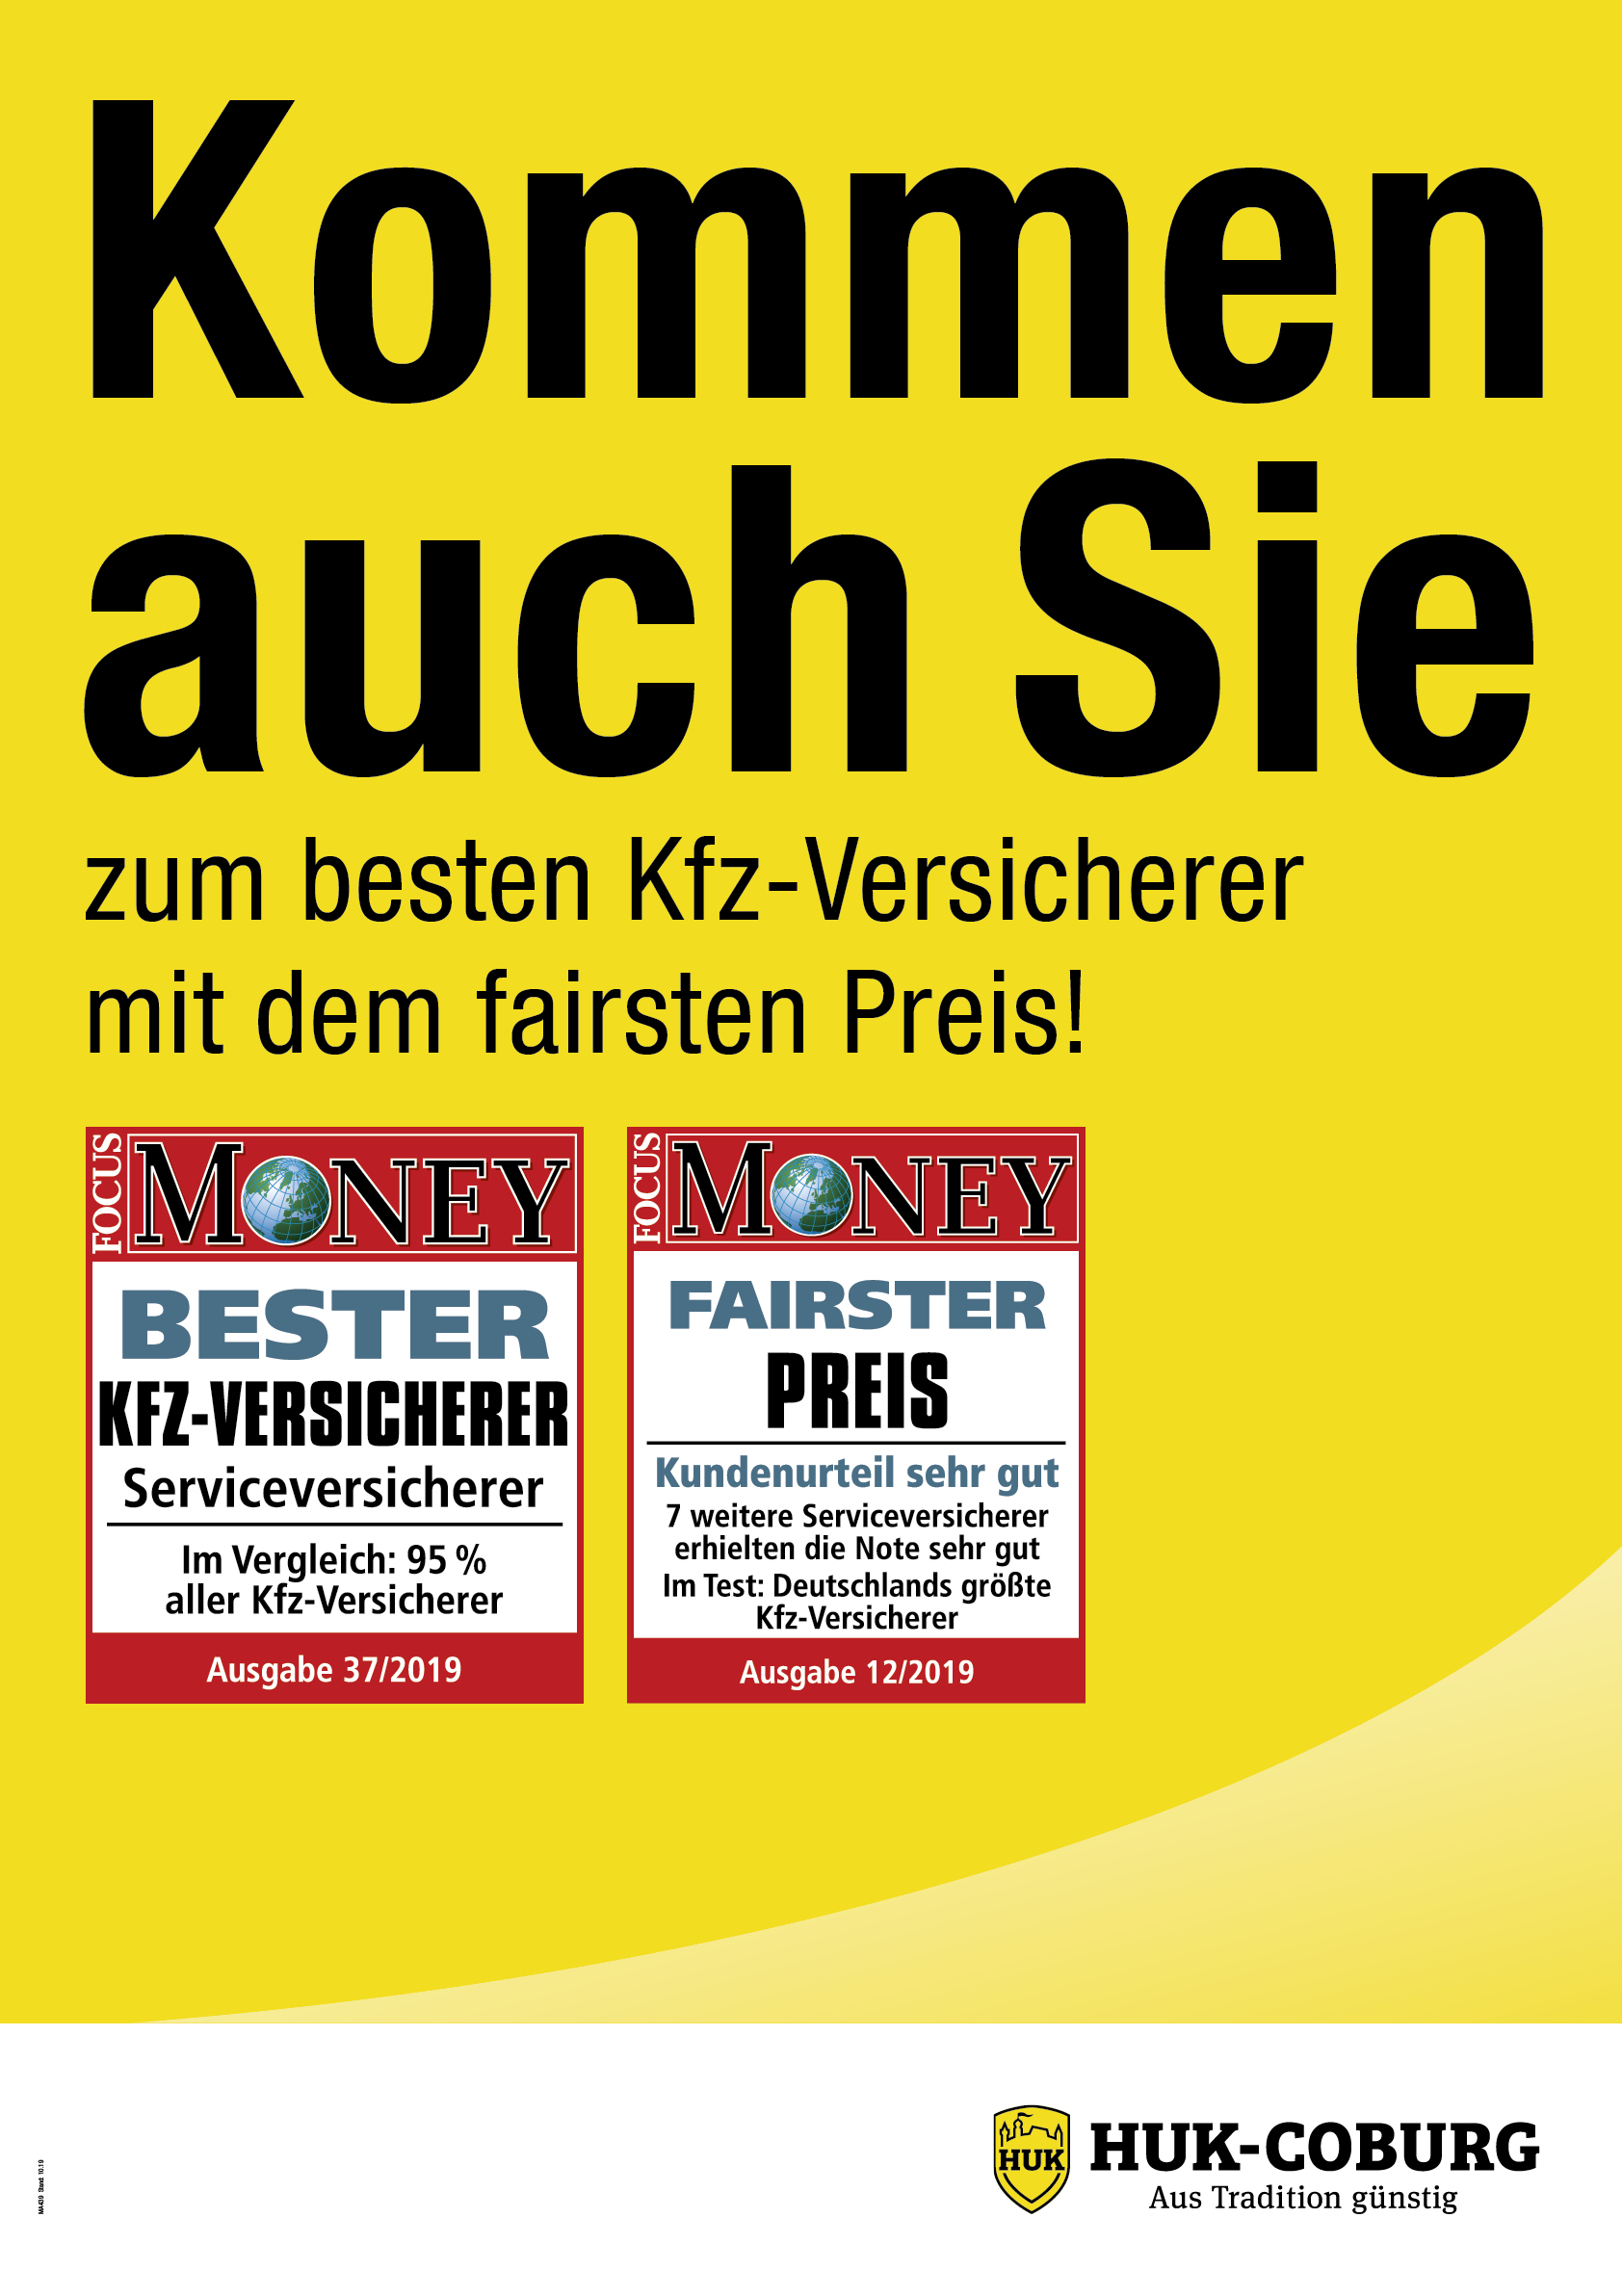 HUK-COBURG Versicherung Torsten Kitzing in Bad Honnef